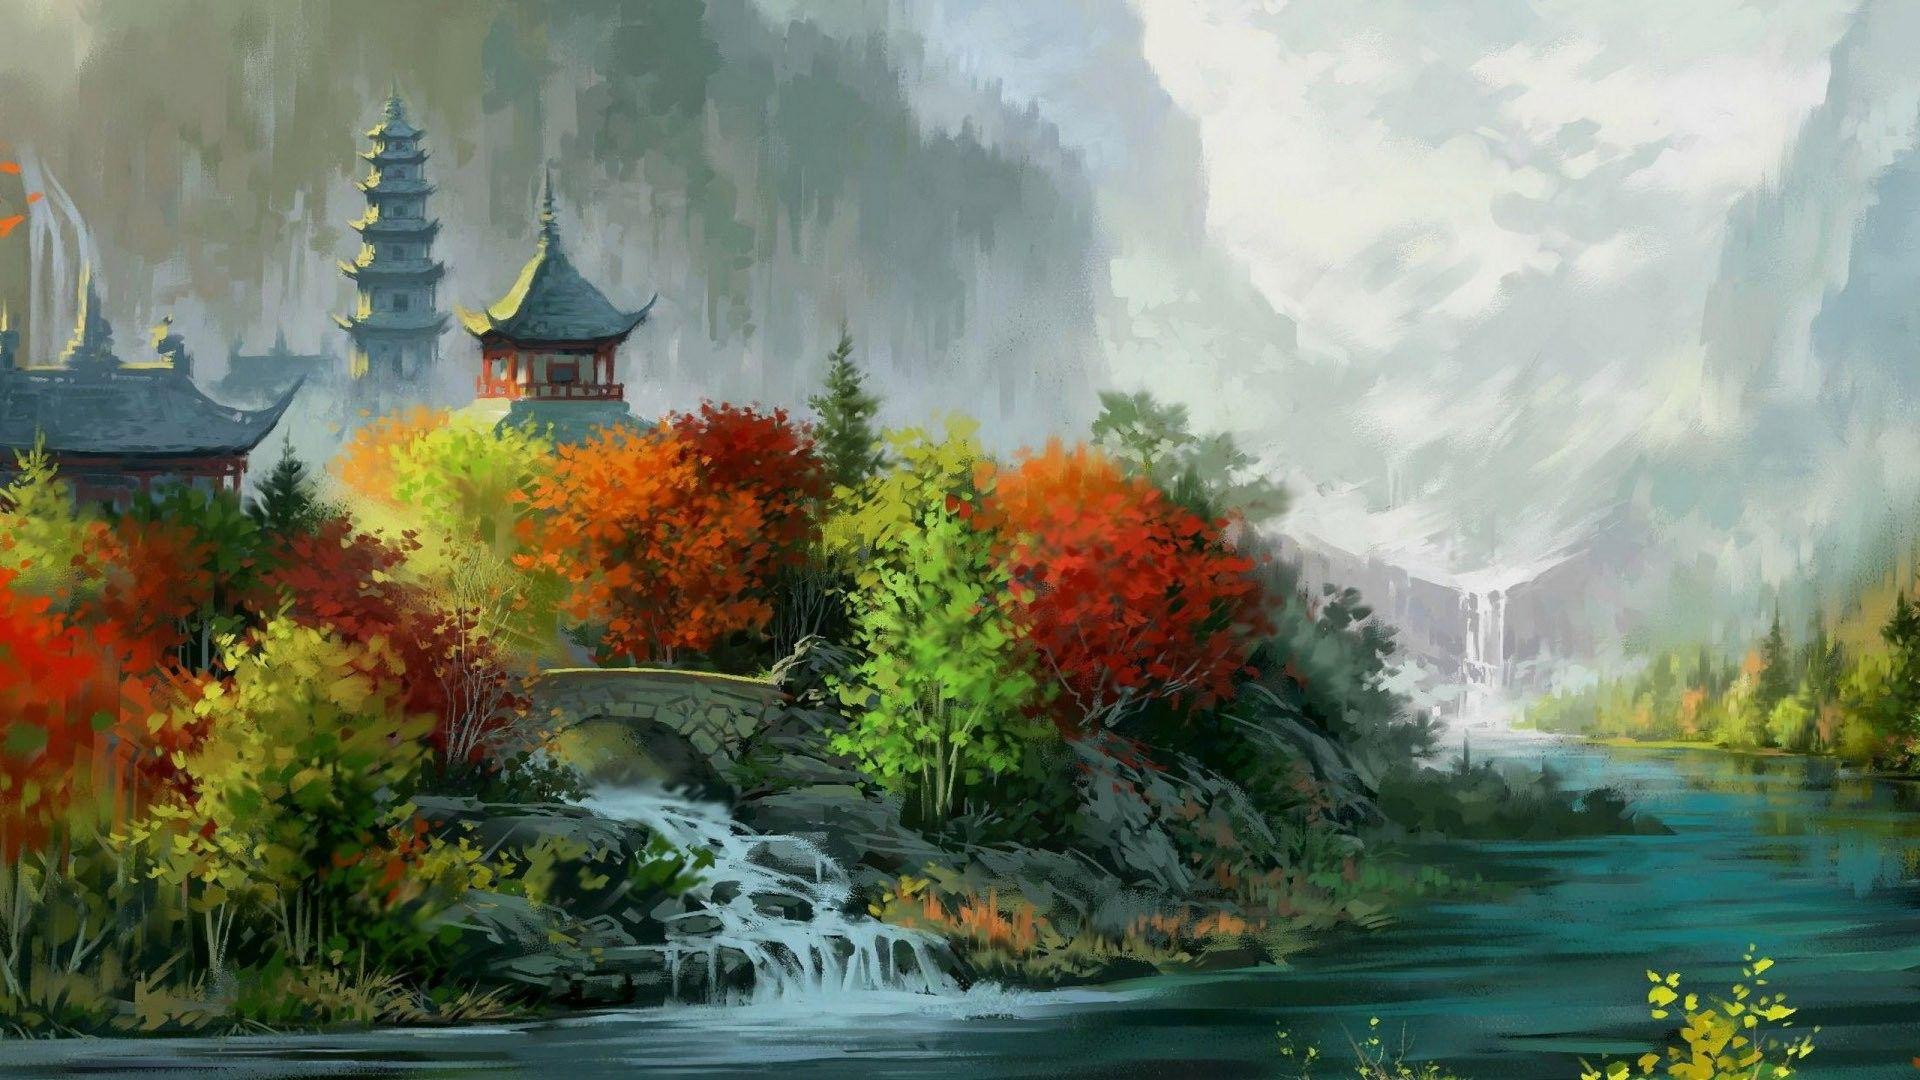 Pagoda wallpaper theme